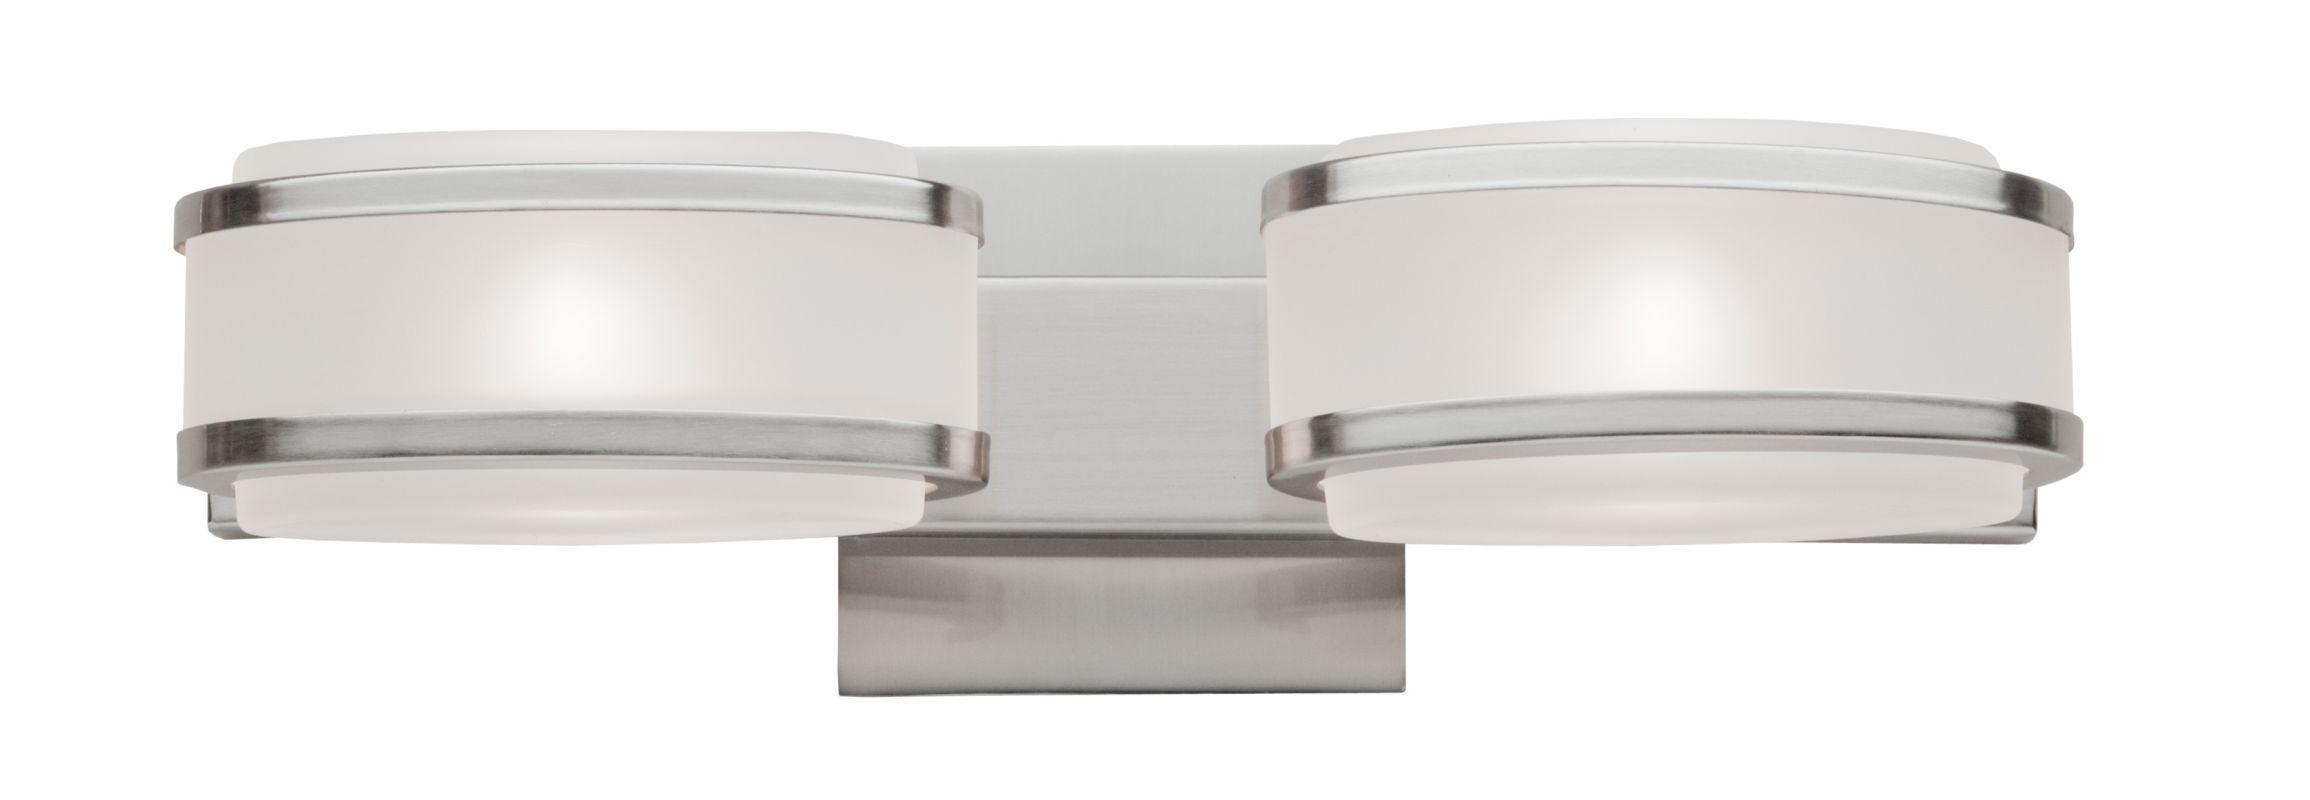 Ada Bathroom Fixtures Ada Compliant Bathroom Faucets Bellacor Ada Accessible Bathroom Faucet